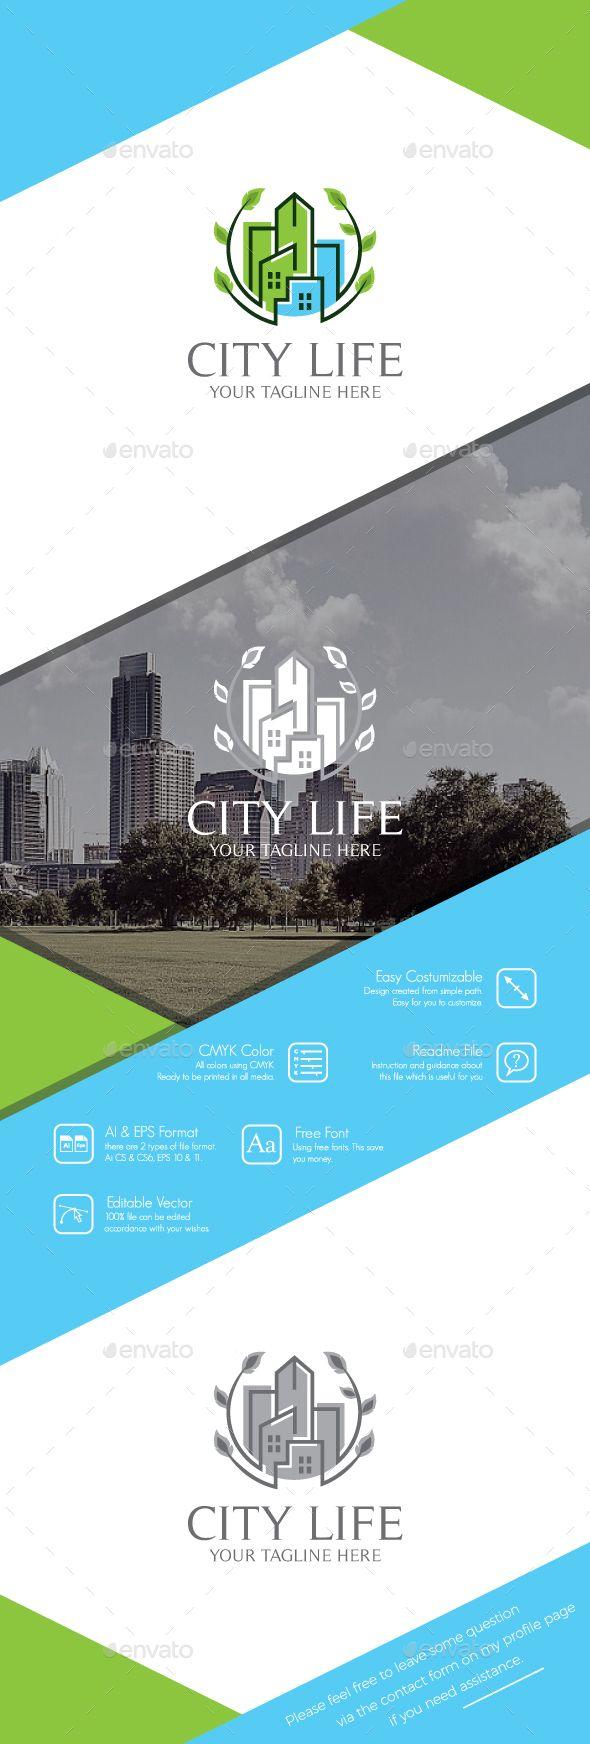 City Life Logo  — EPS Template #housing #logo • Download ➝ https://graphicriver.net/item/city-life-logo/18453242?ref=pxcr